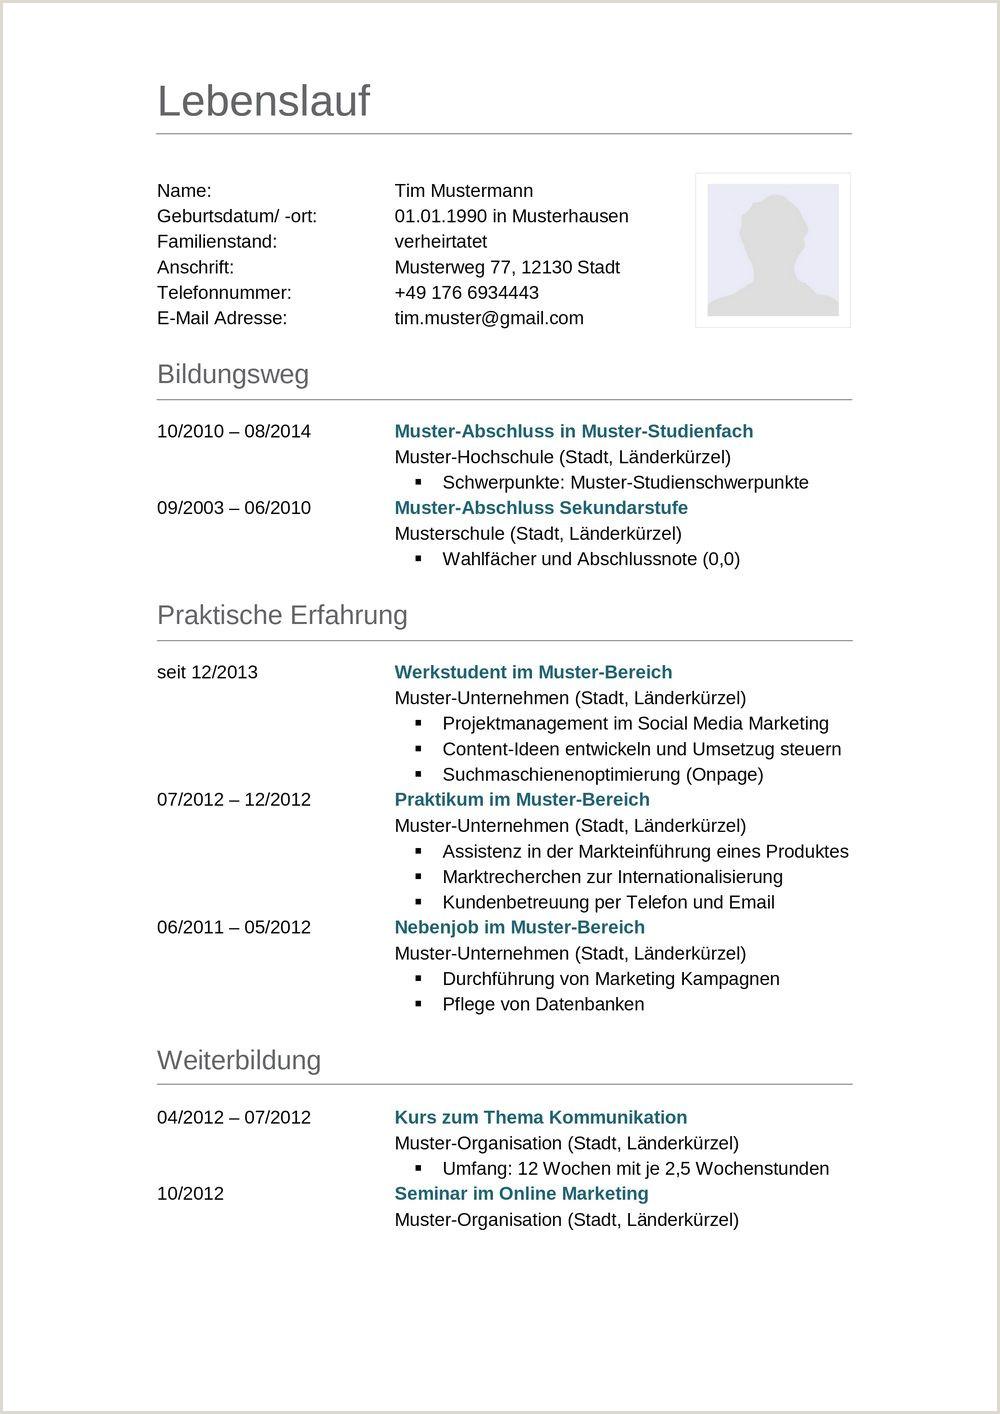 Lebenslauf Muster Tabellarisch Schüler 1 Mahnung Muster 2019 01